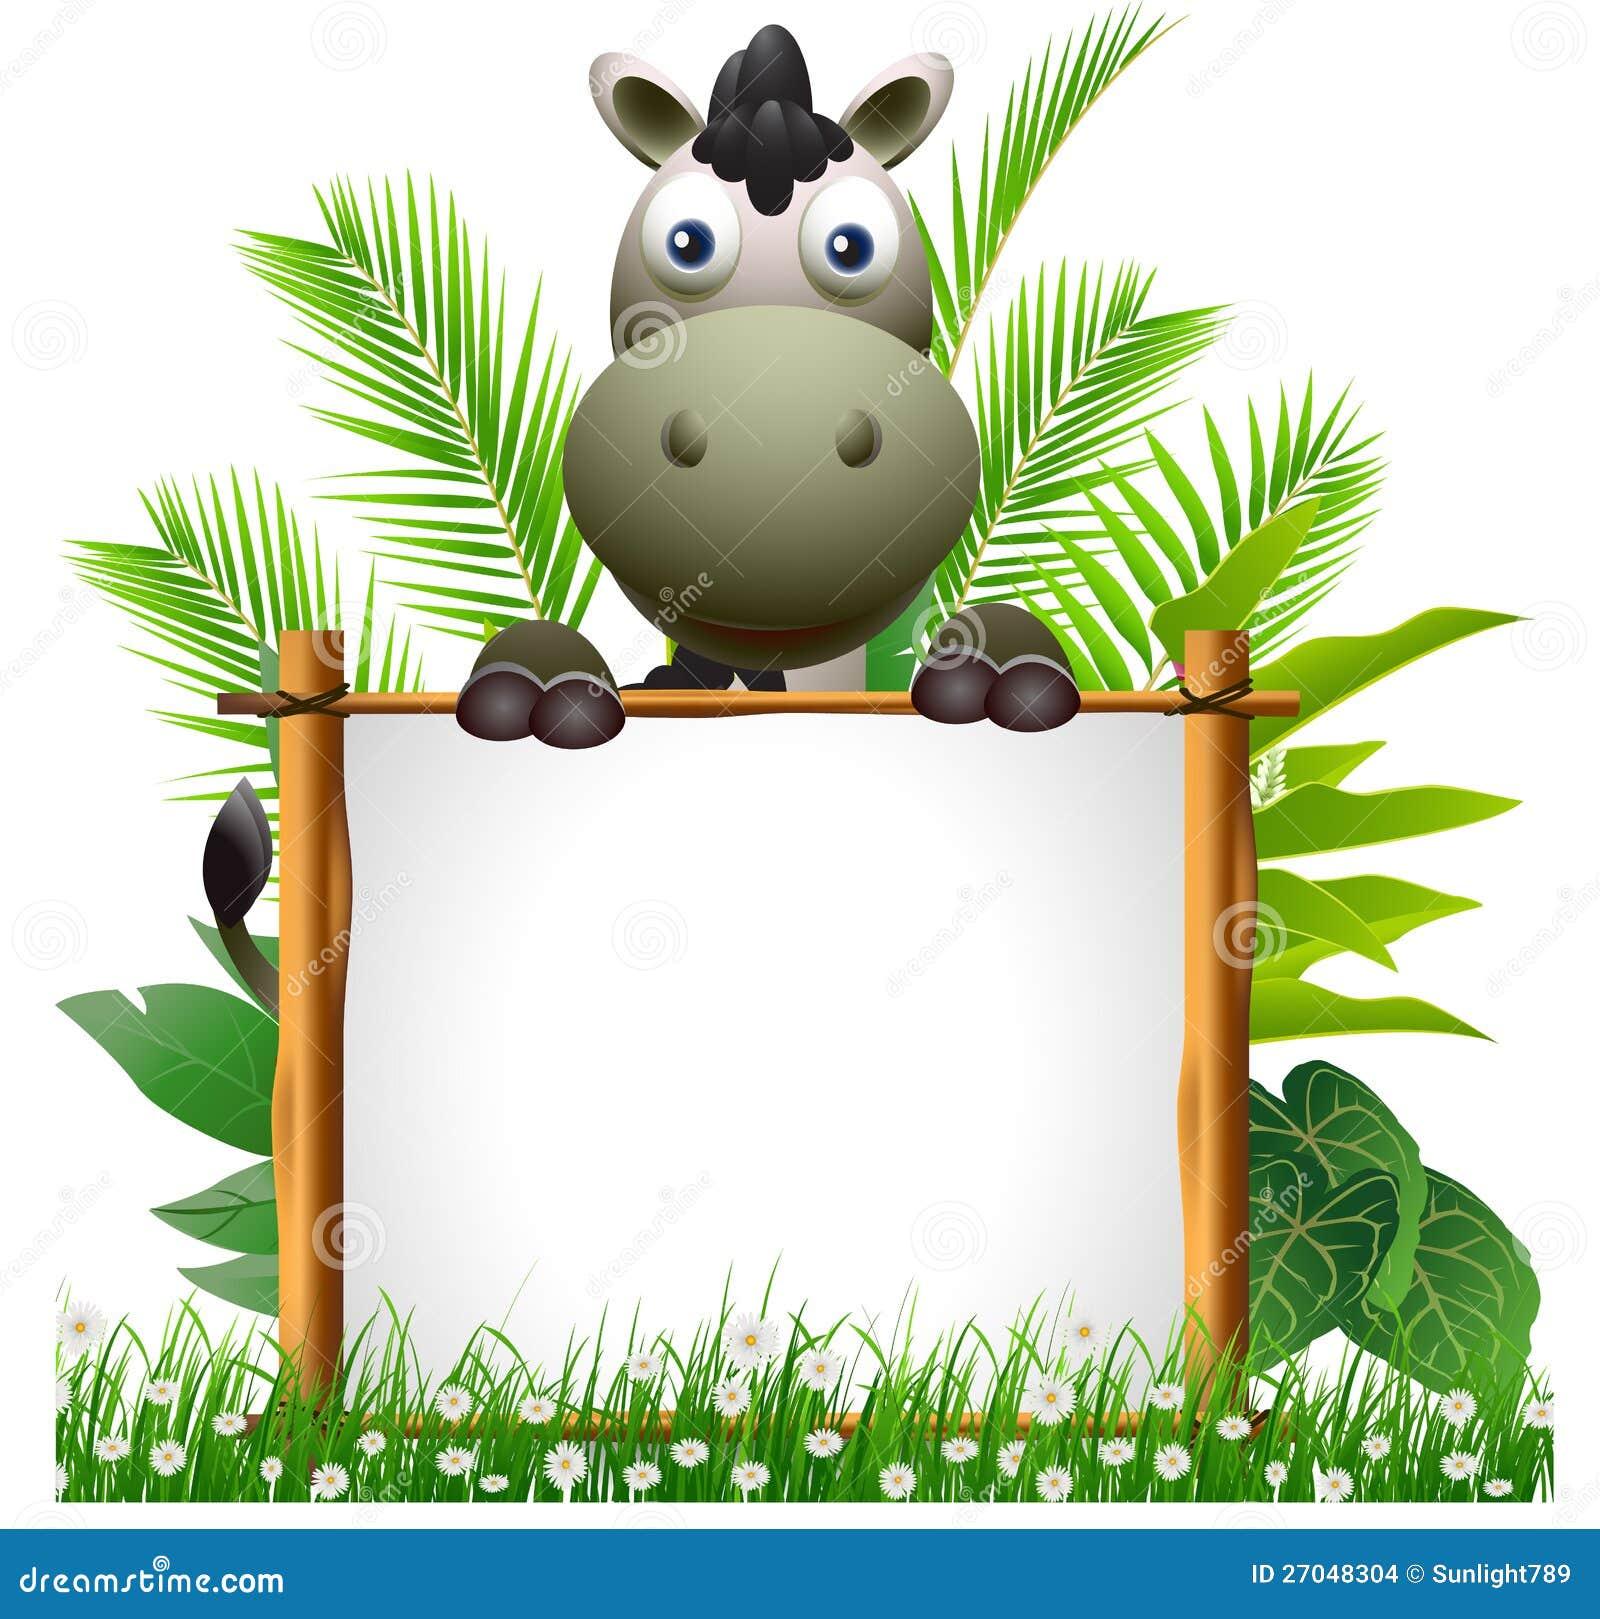 Safari jungle animals clip art and safari animals - Cute Zebra Cartoon With Blank Sign Stock Images Image